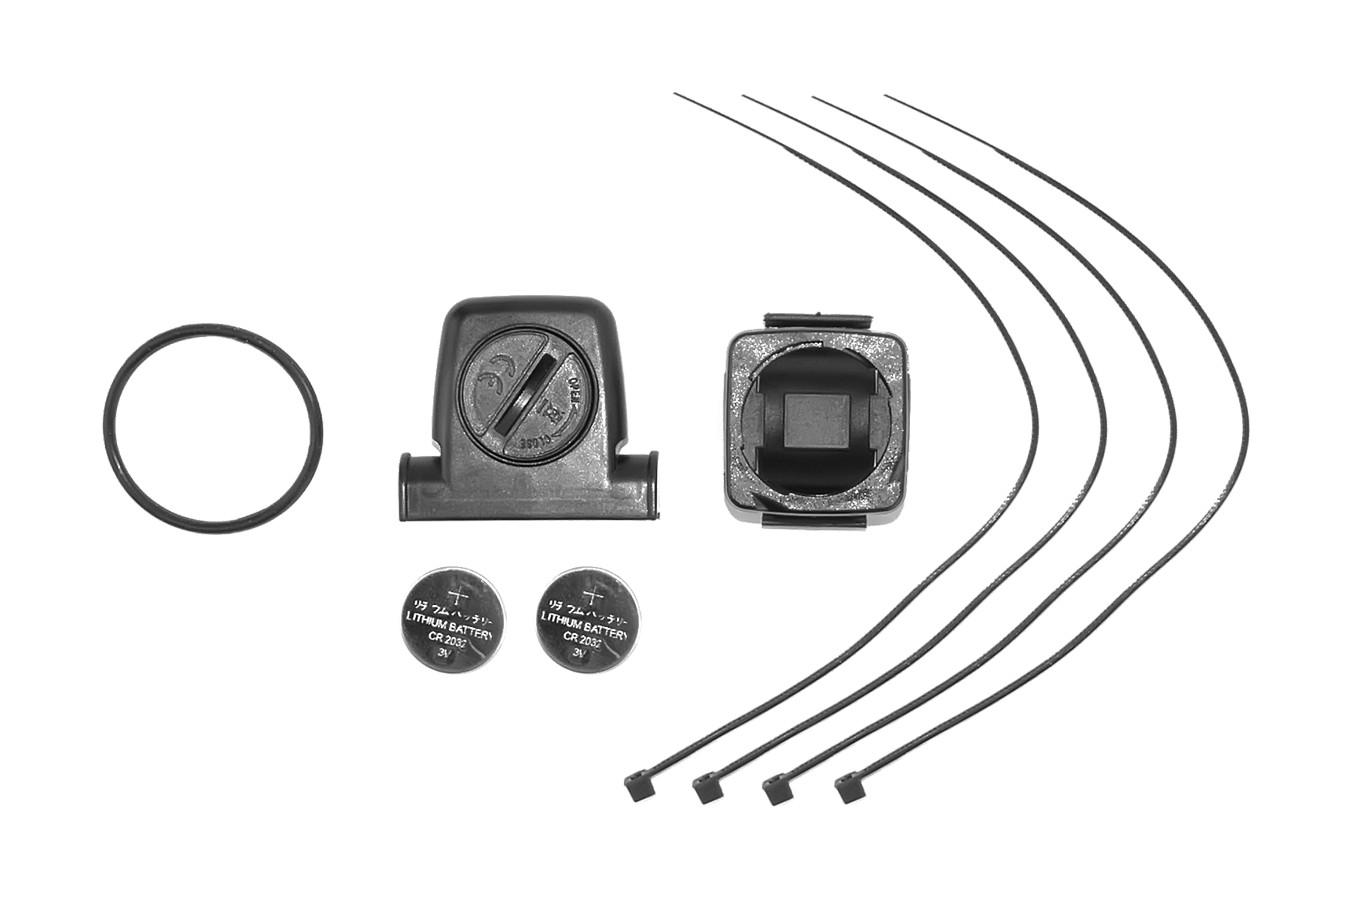 Velocímetro Bike Digital Multifunções SD-568 Sem Fio Com LED - Sunding